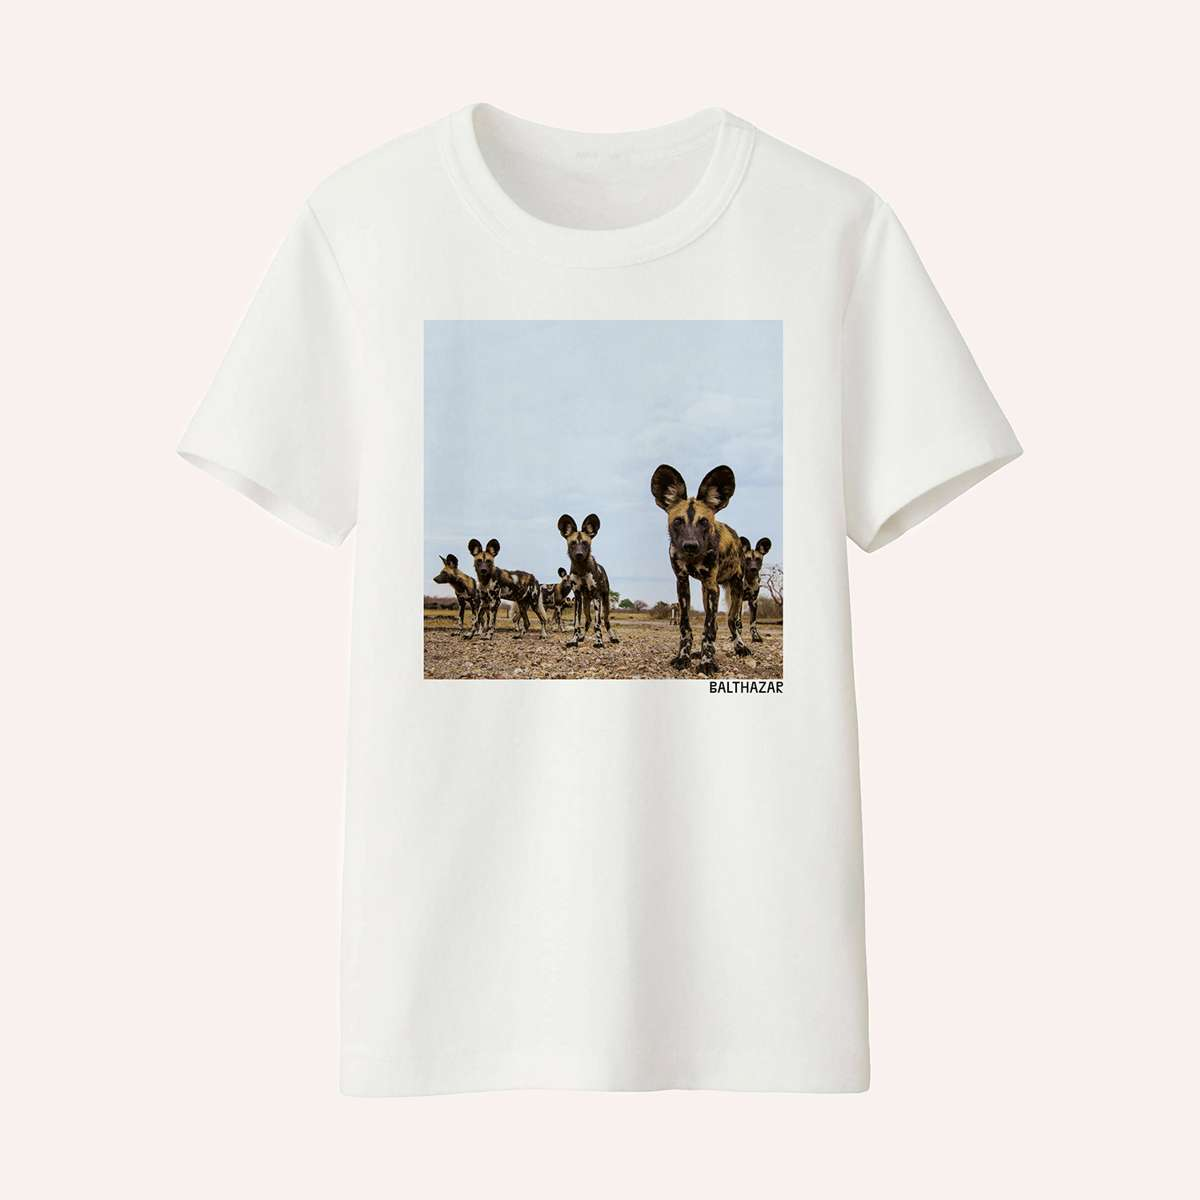 T-Shirt (White with Print) - Balthazar Merch